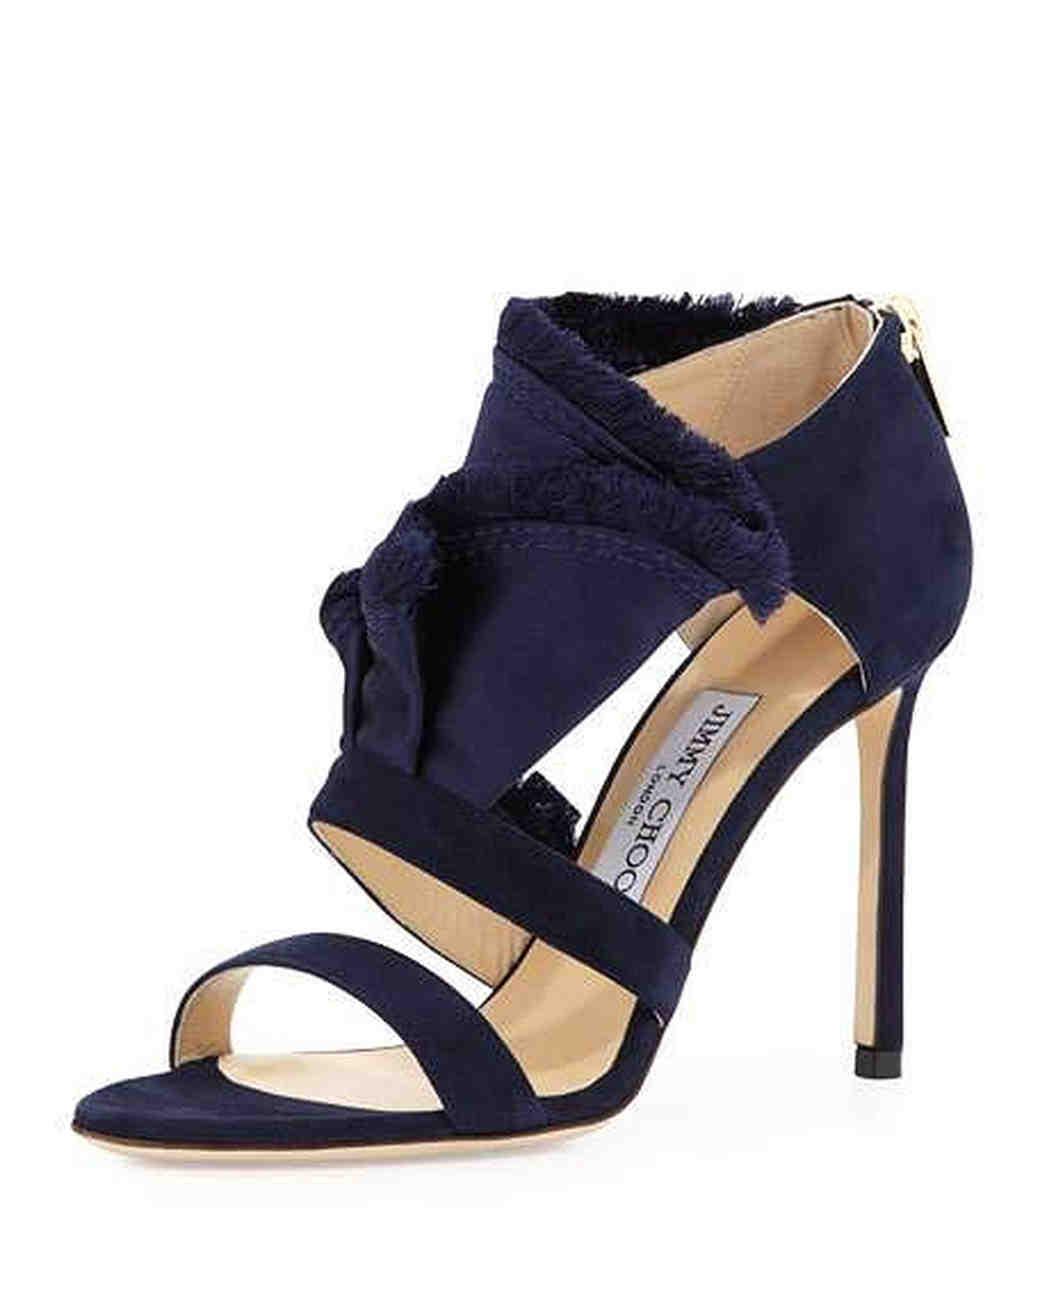 Jimmy Choo Blue Fringe Sandals